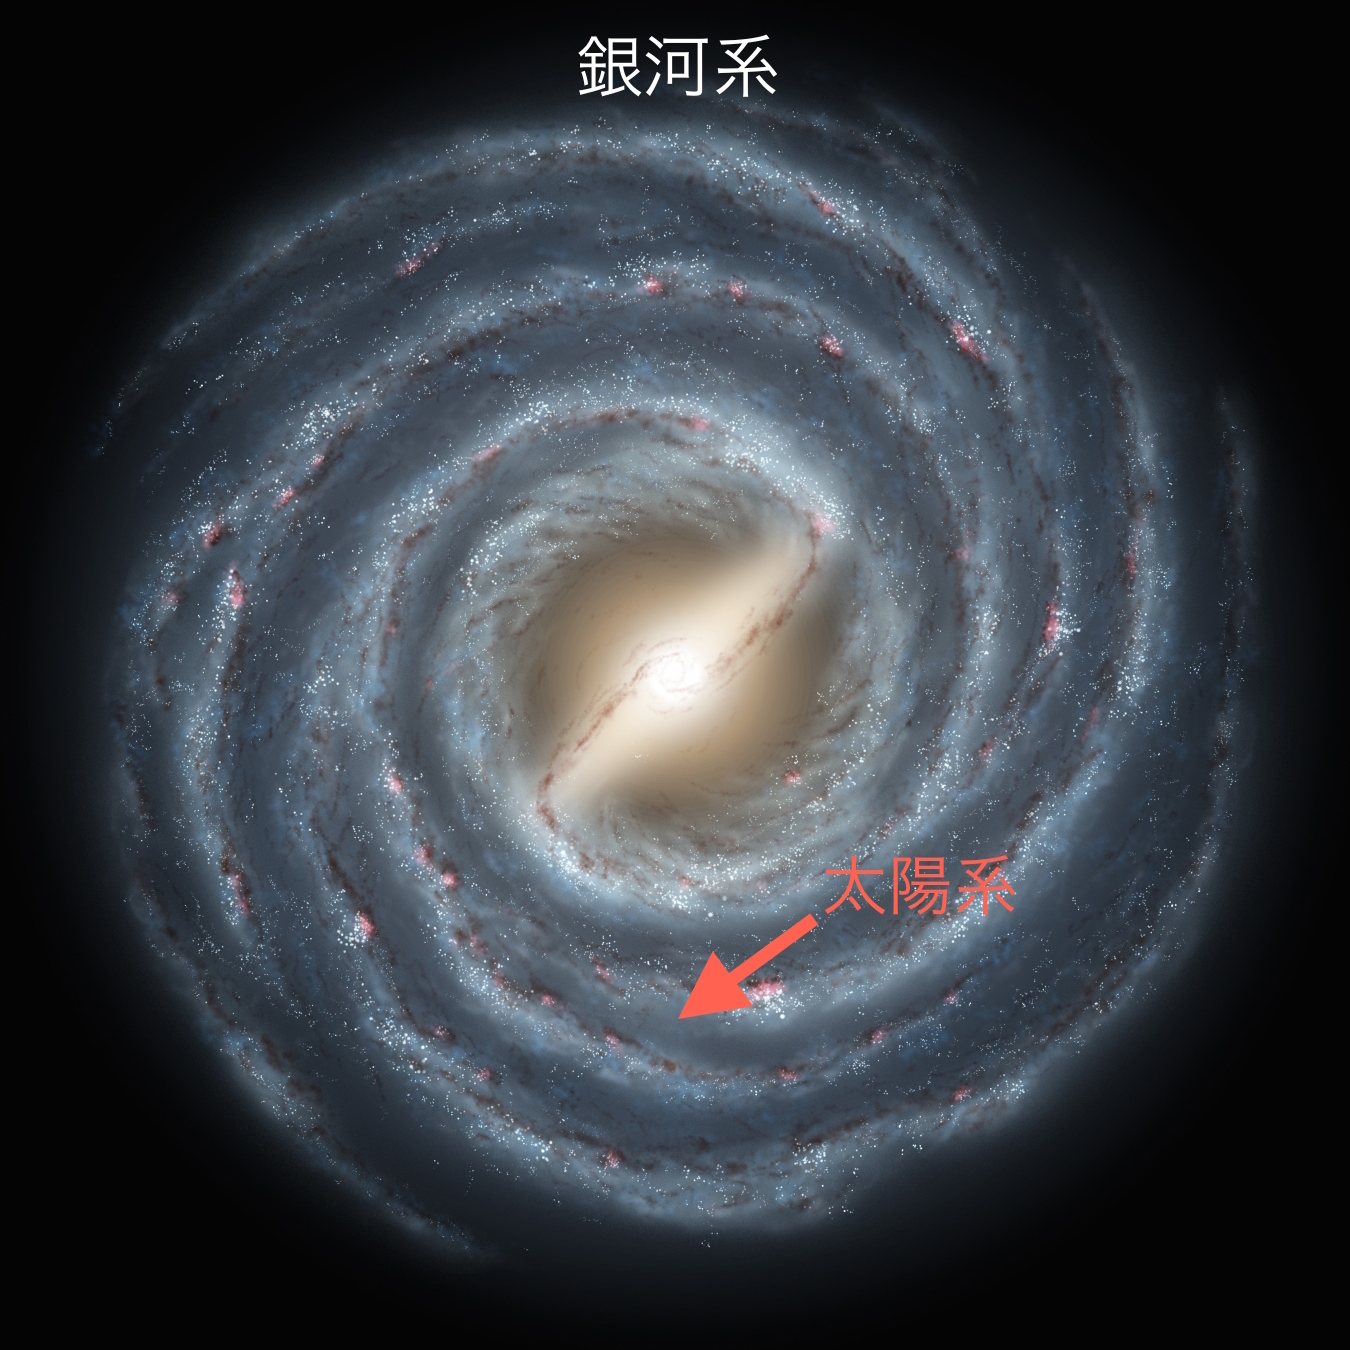 1462740_1462023_Milky_Way_2005